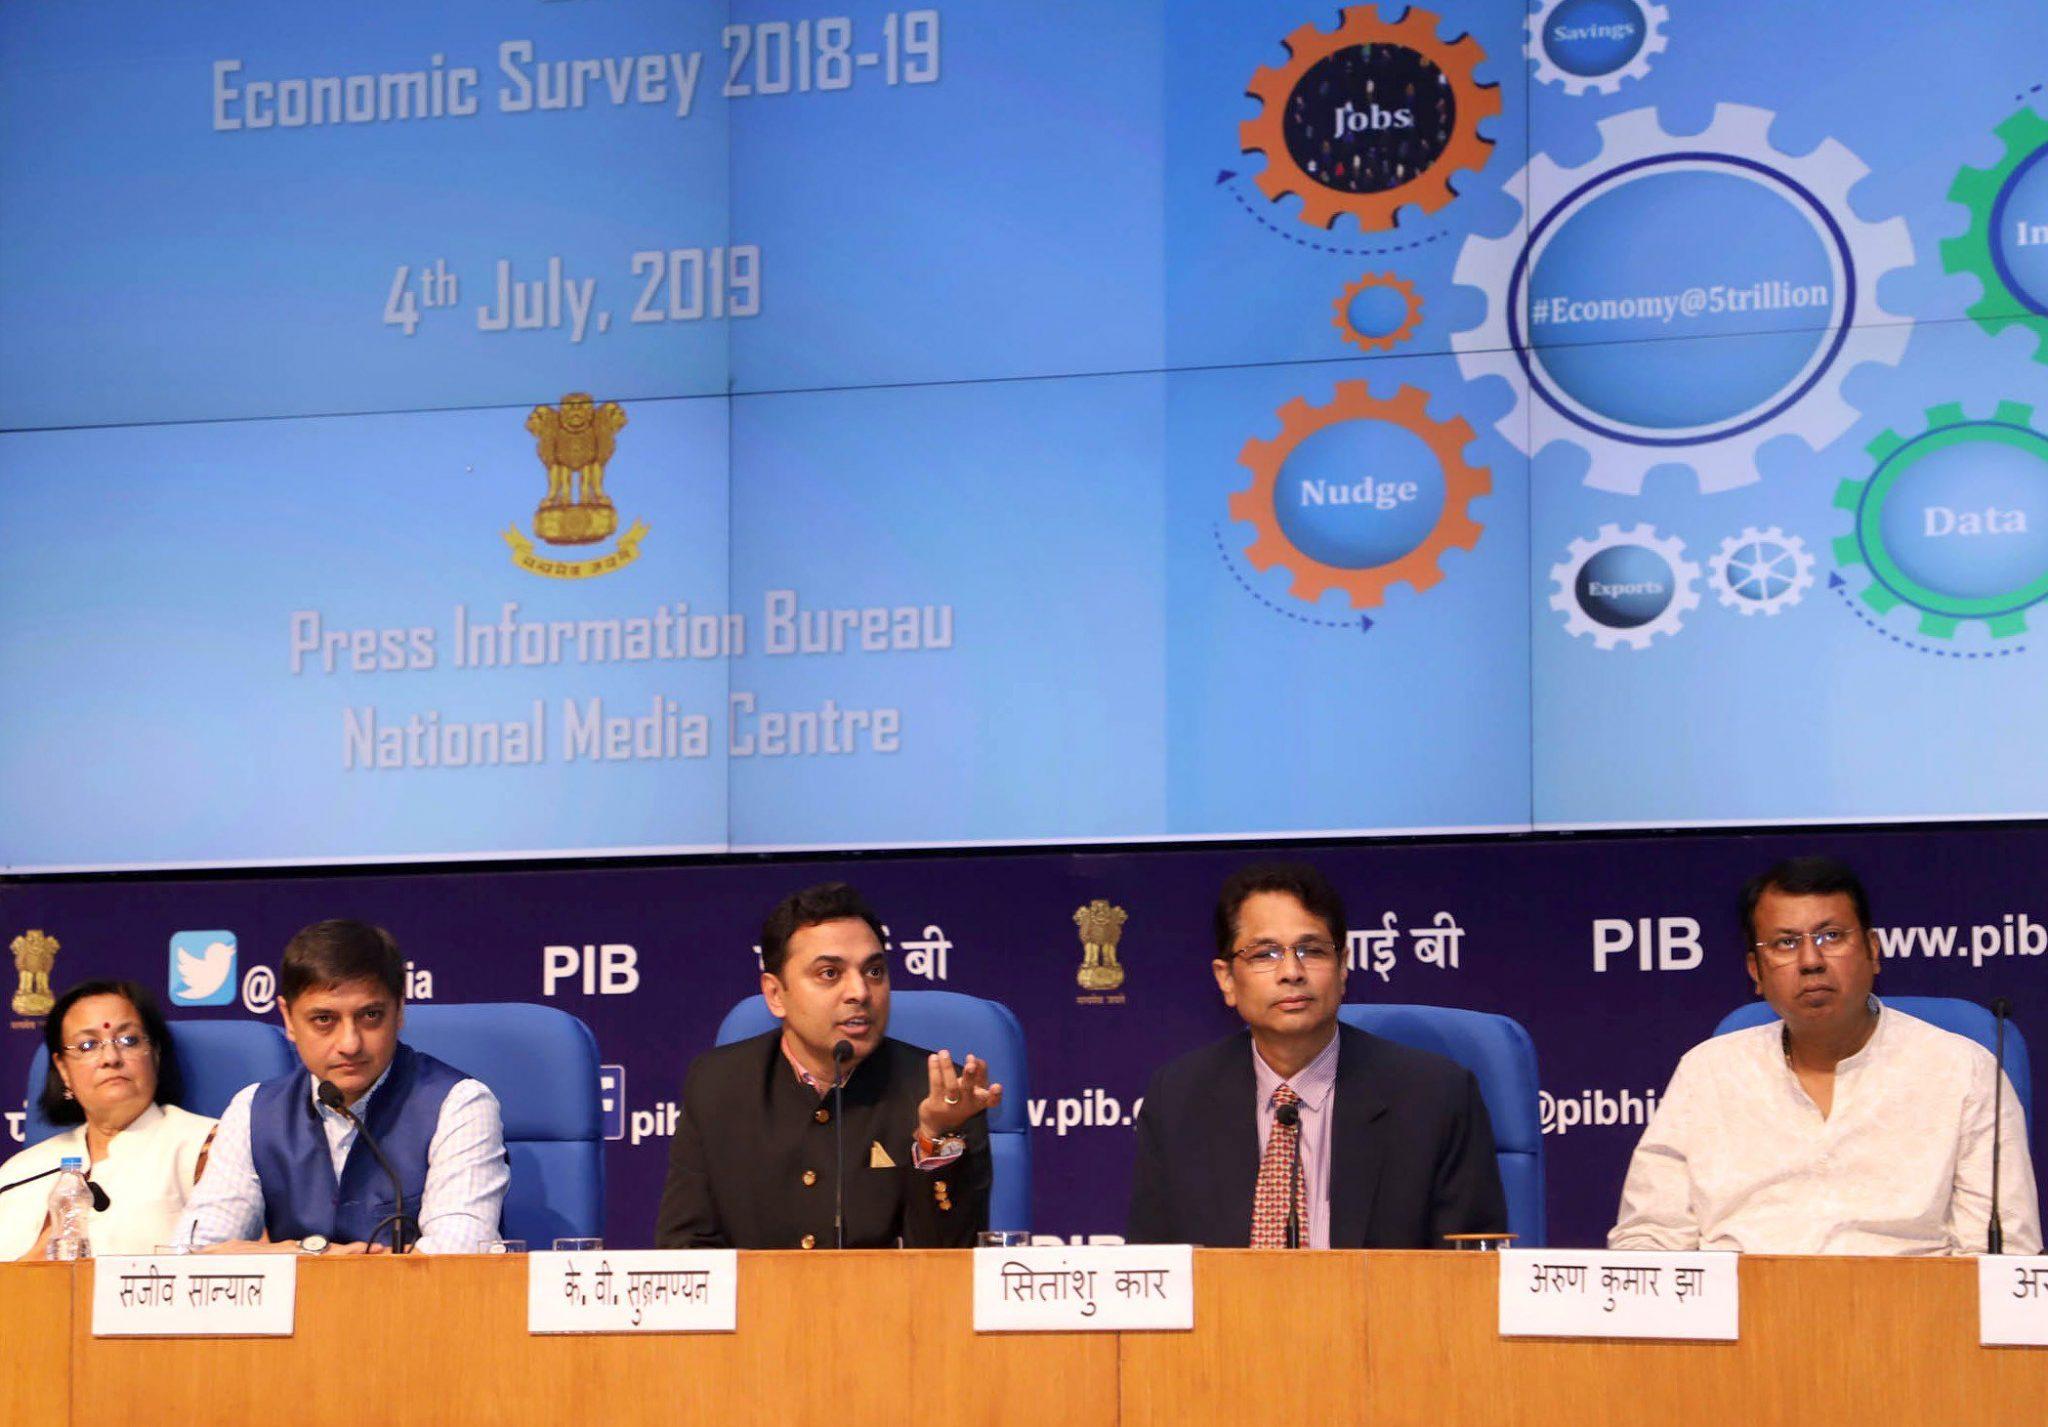 Economic Survey 2019 Shows The Government's Rising Interest Towards Data